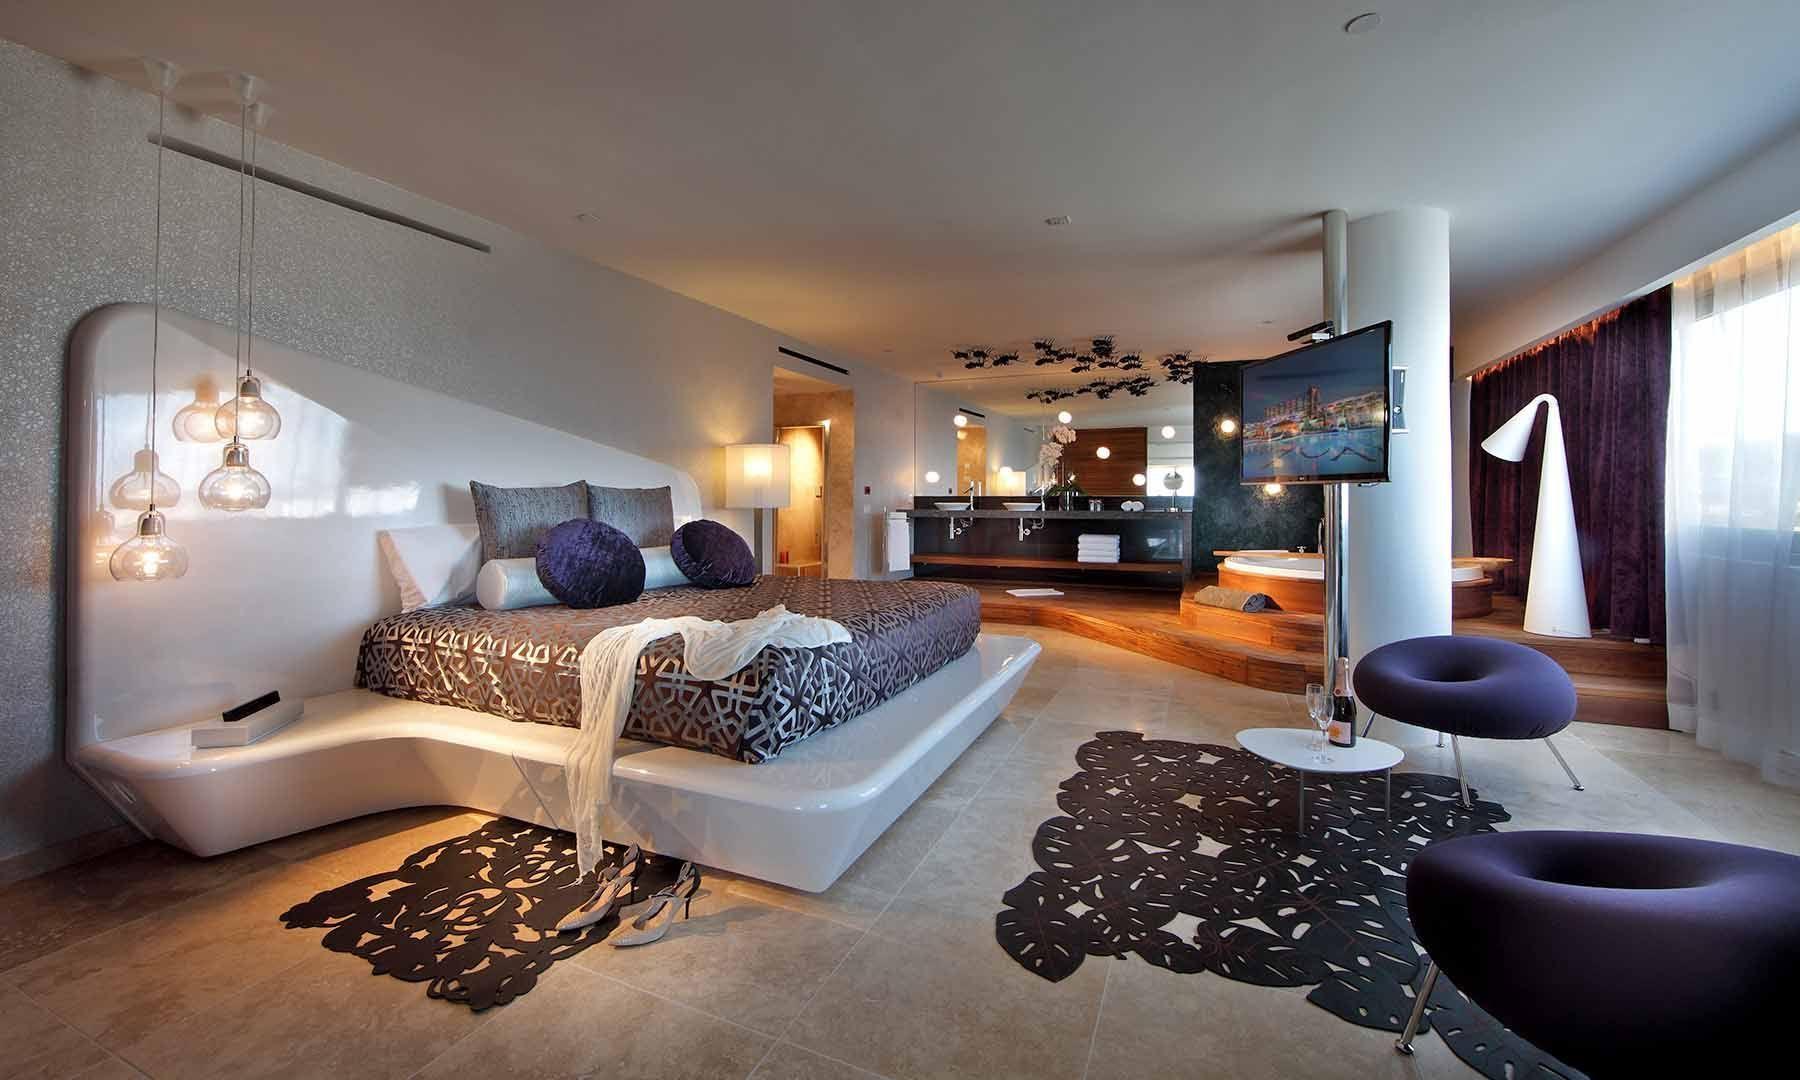 Die Schonsten Hotelzimmer In Der Welt Luxurious Bedrooms